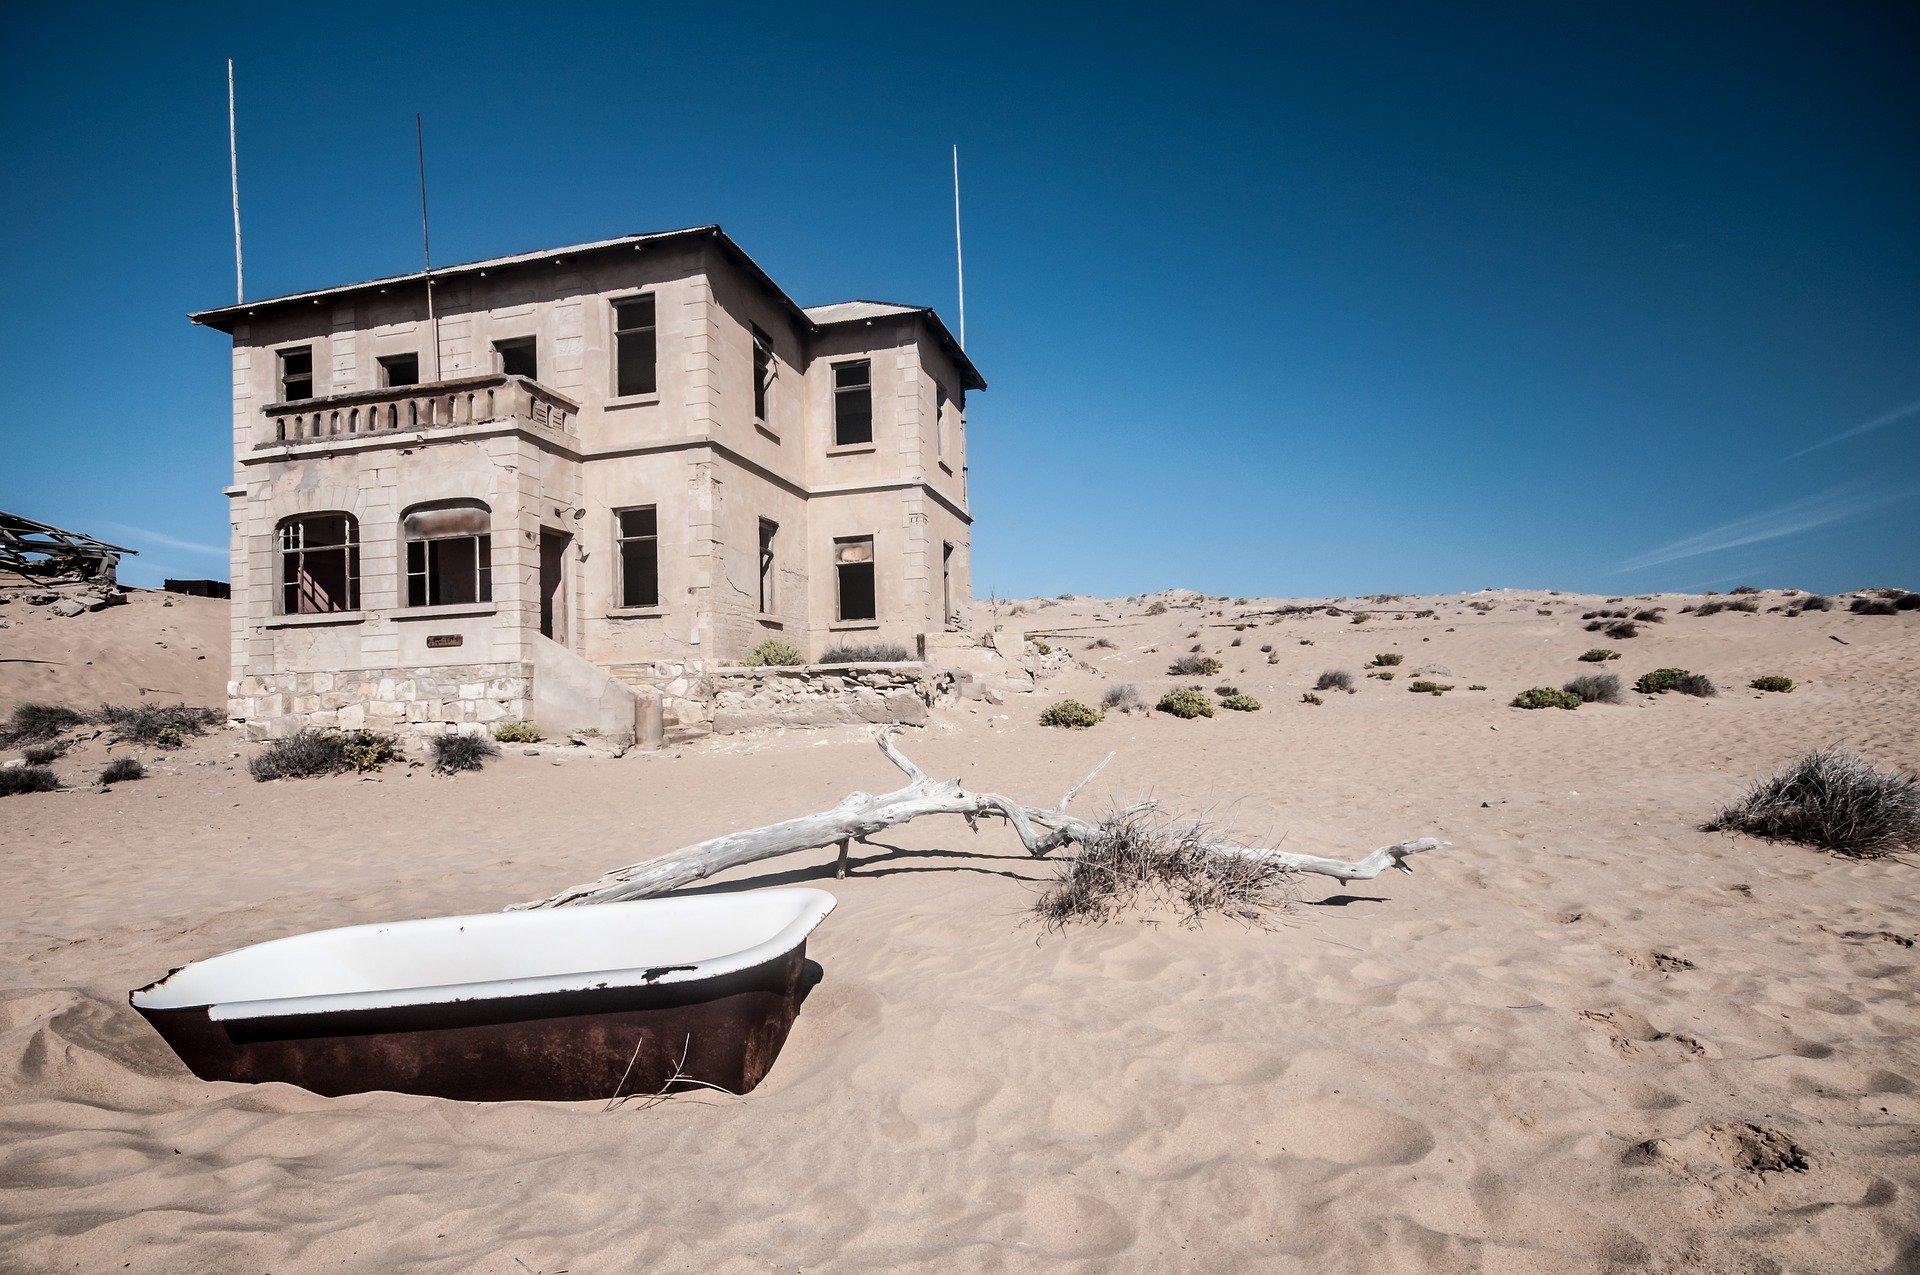 Namibia Sehenswürdigkeiten - Kolmannskuppe